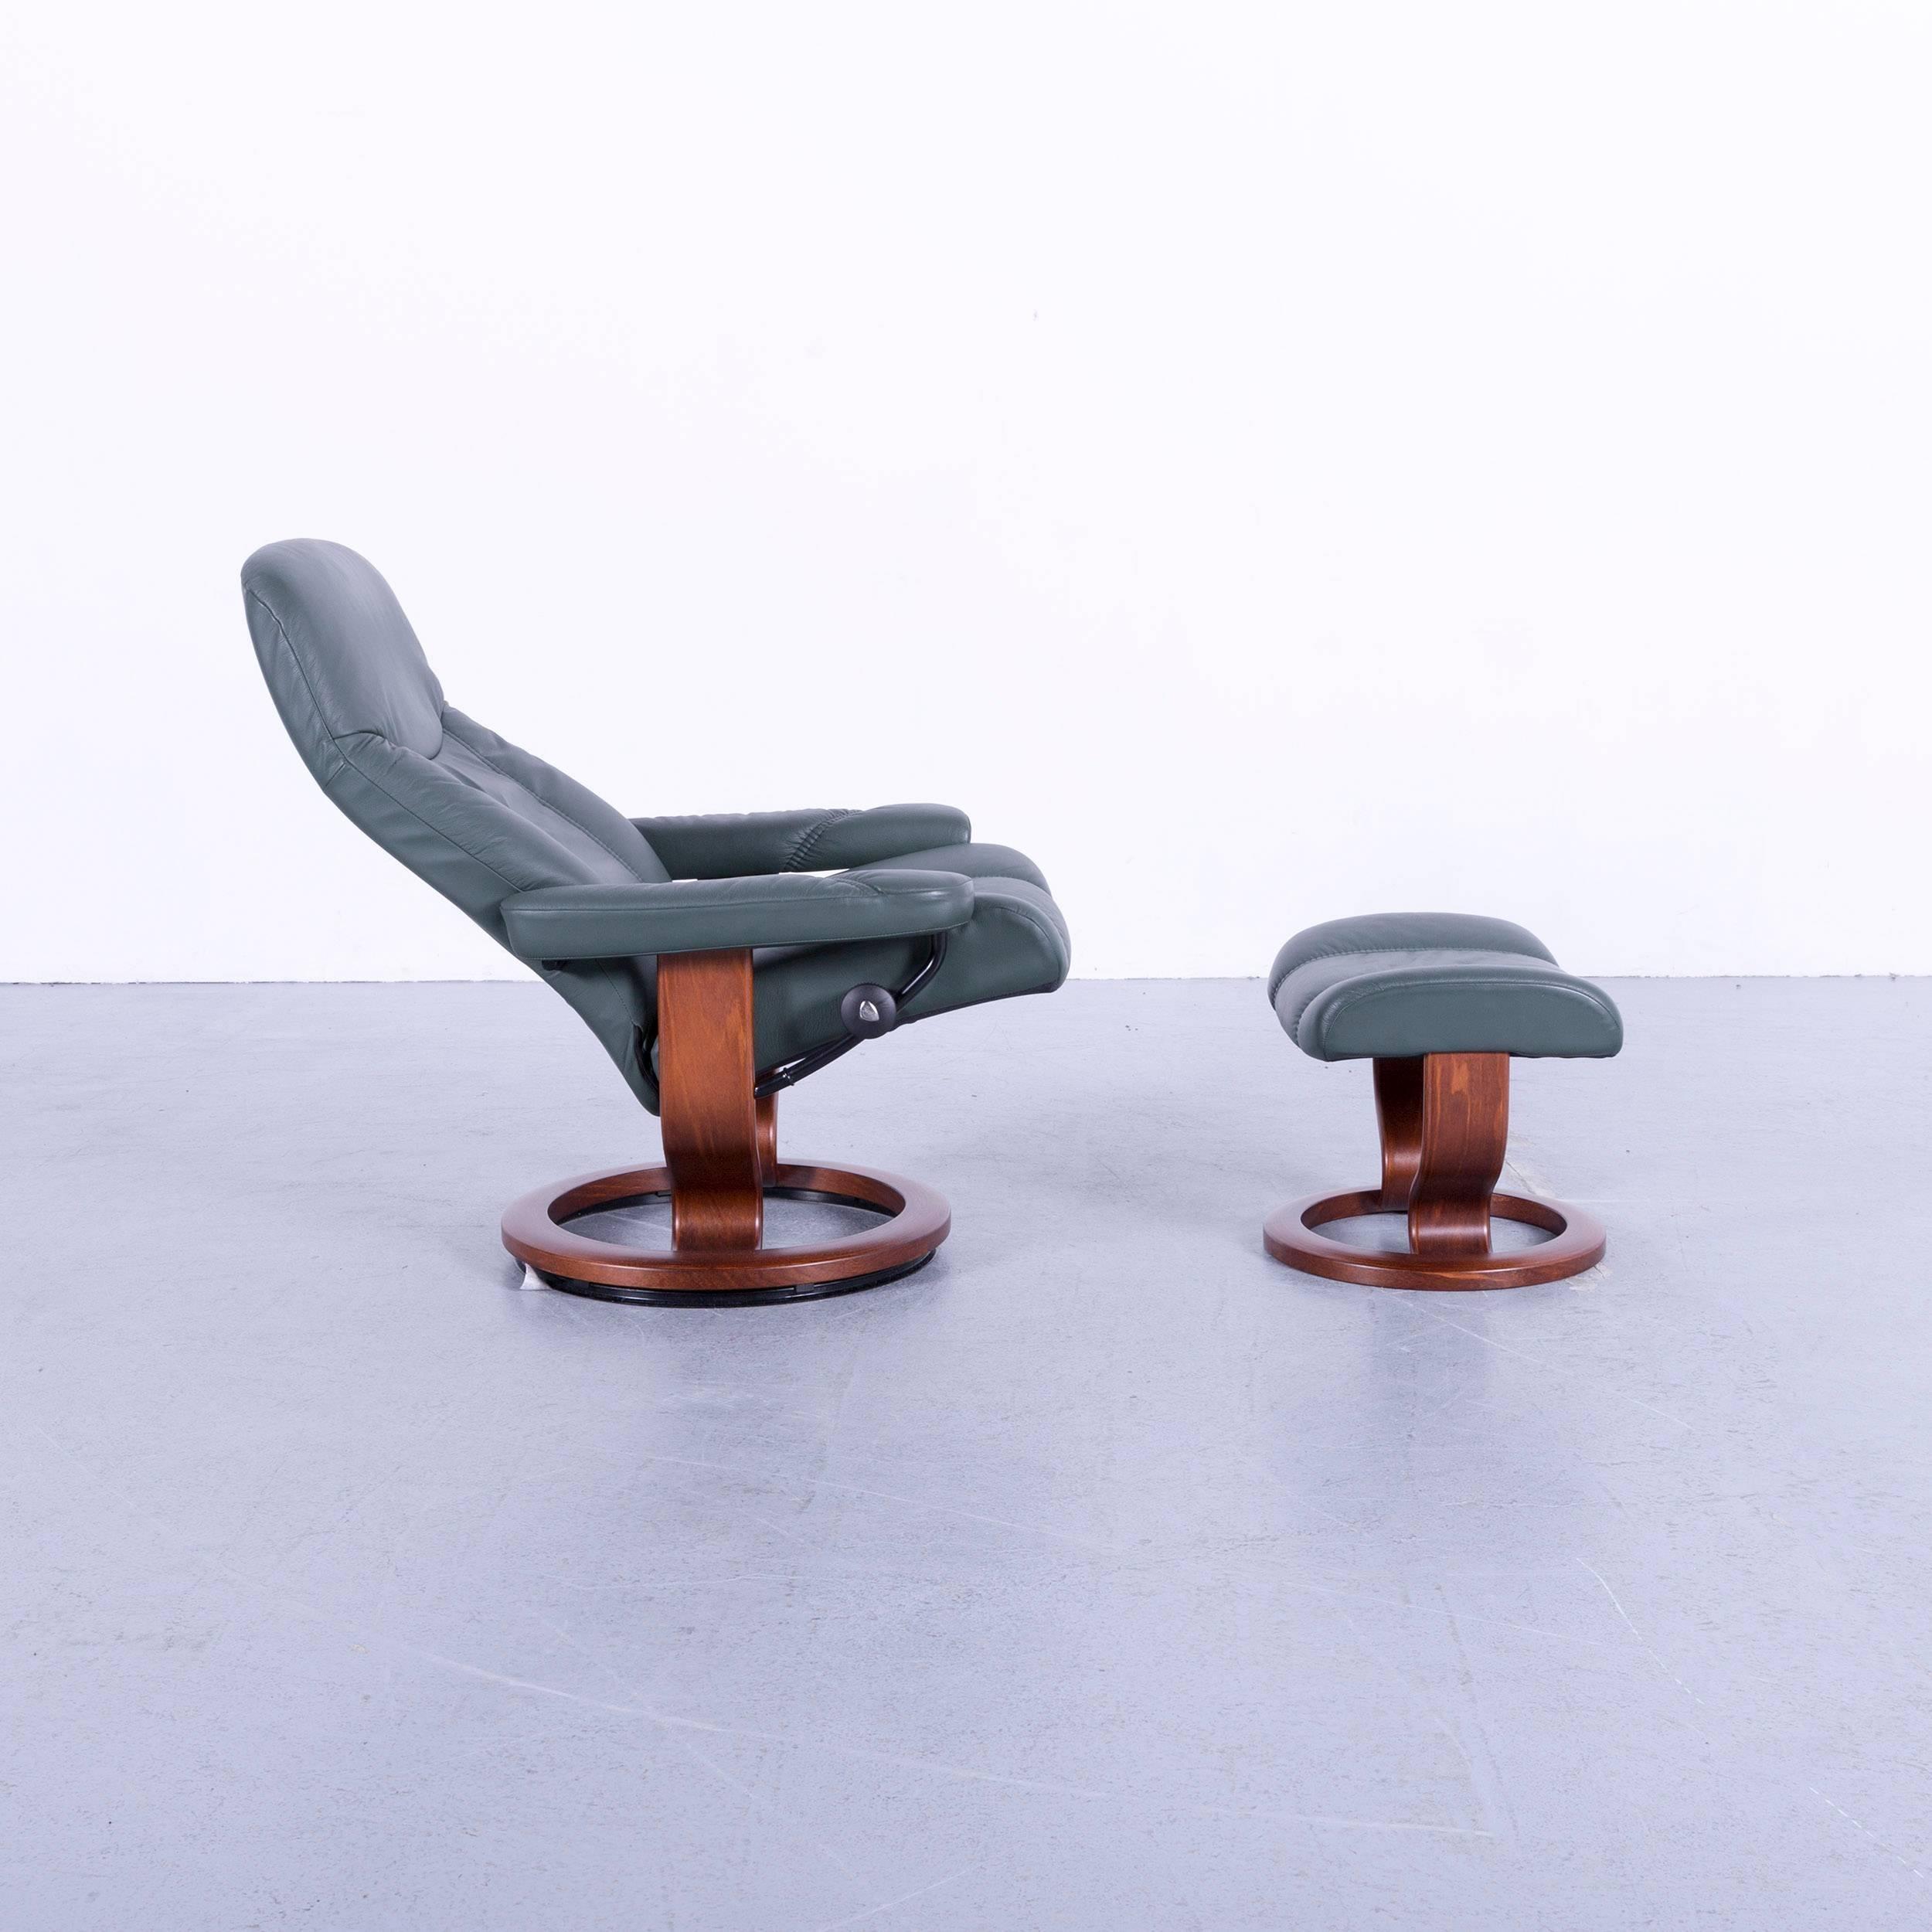 Fabulous Ekornes Stressless Consul Armchair Set Green Leather Modern Creativecarmelina Interior Chair Design Creativecarmelinacom